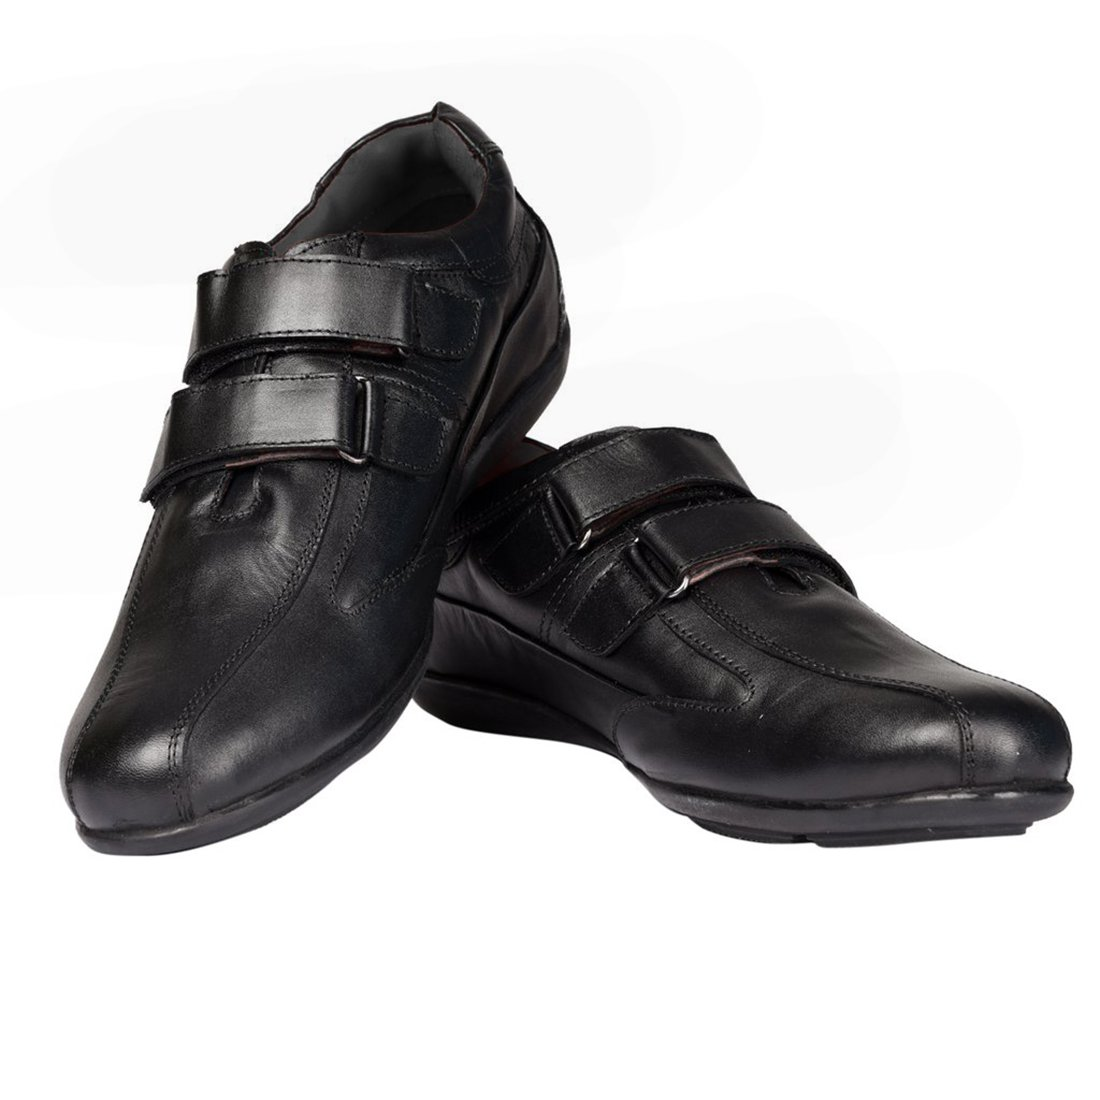 Buy Costoso Italiano Black Leather